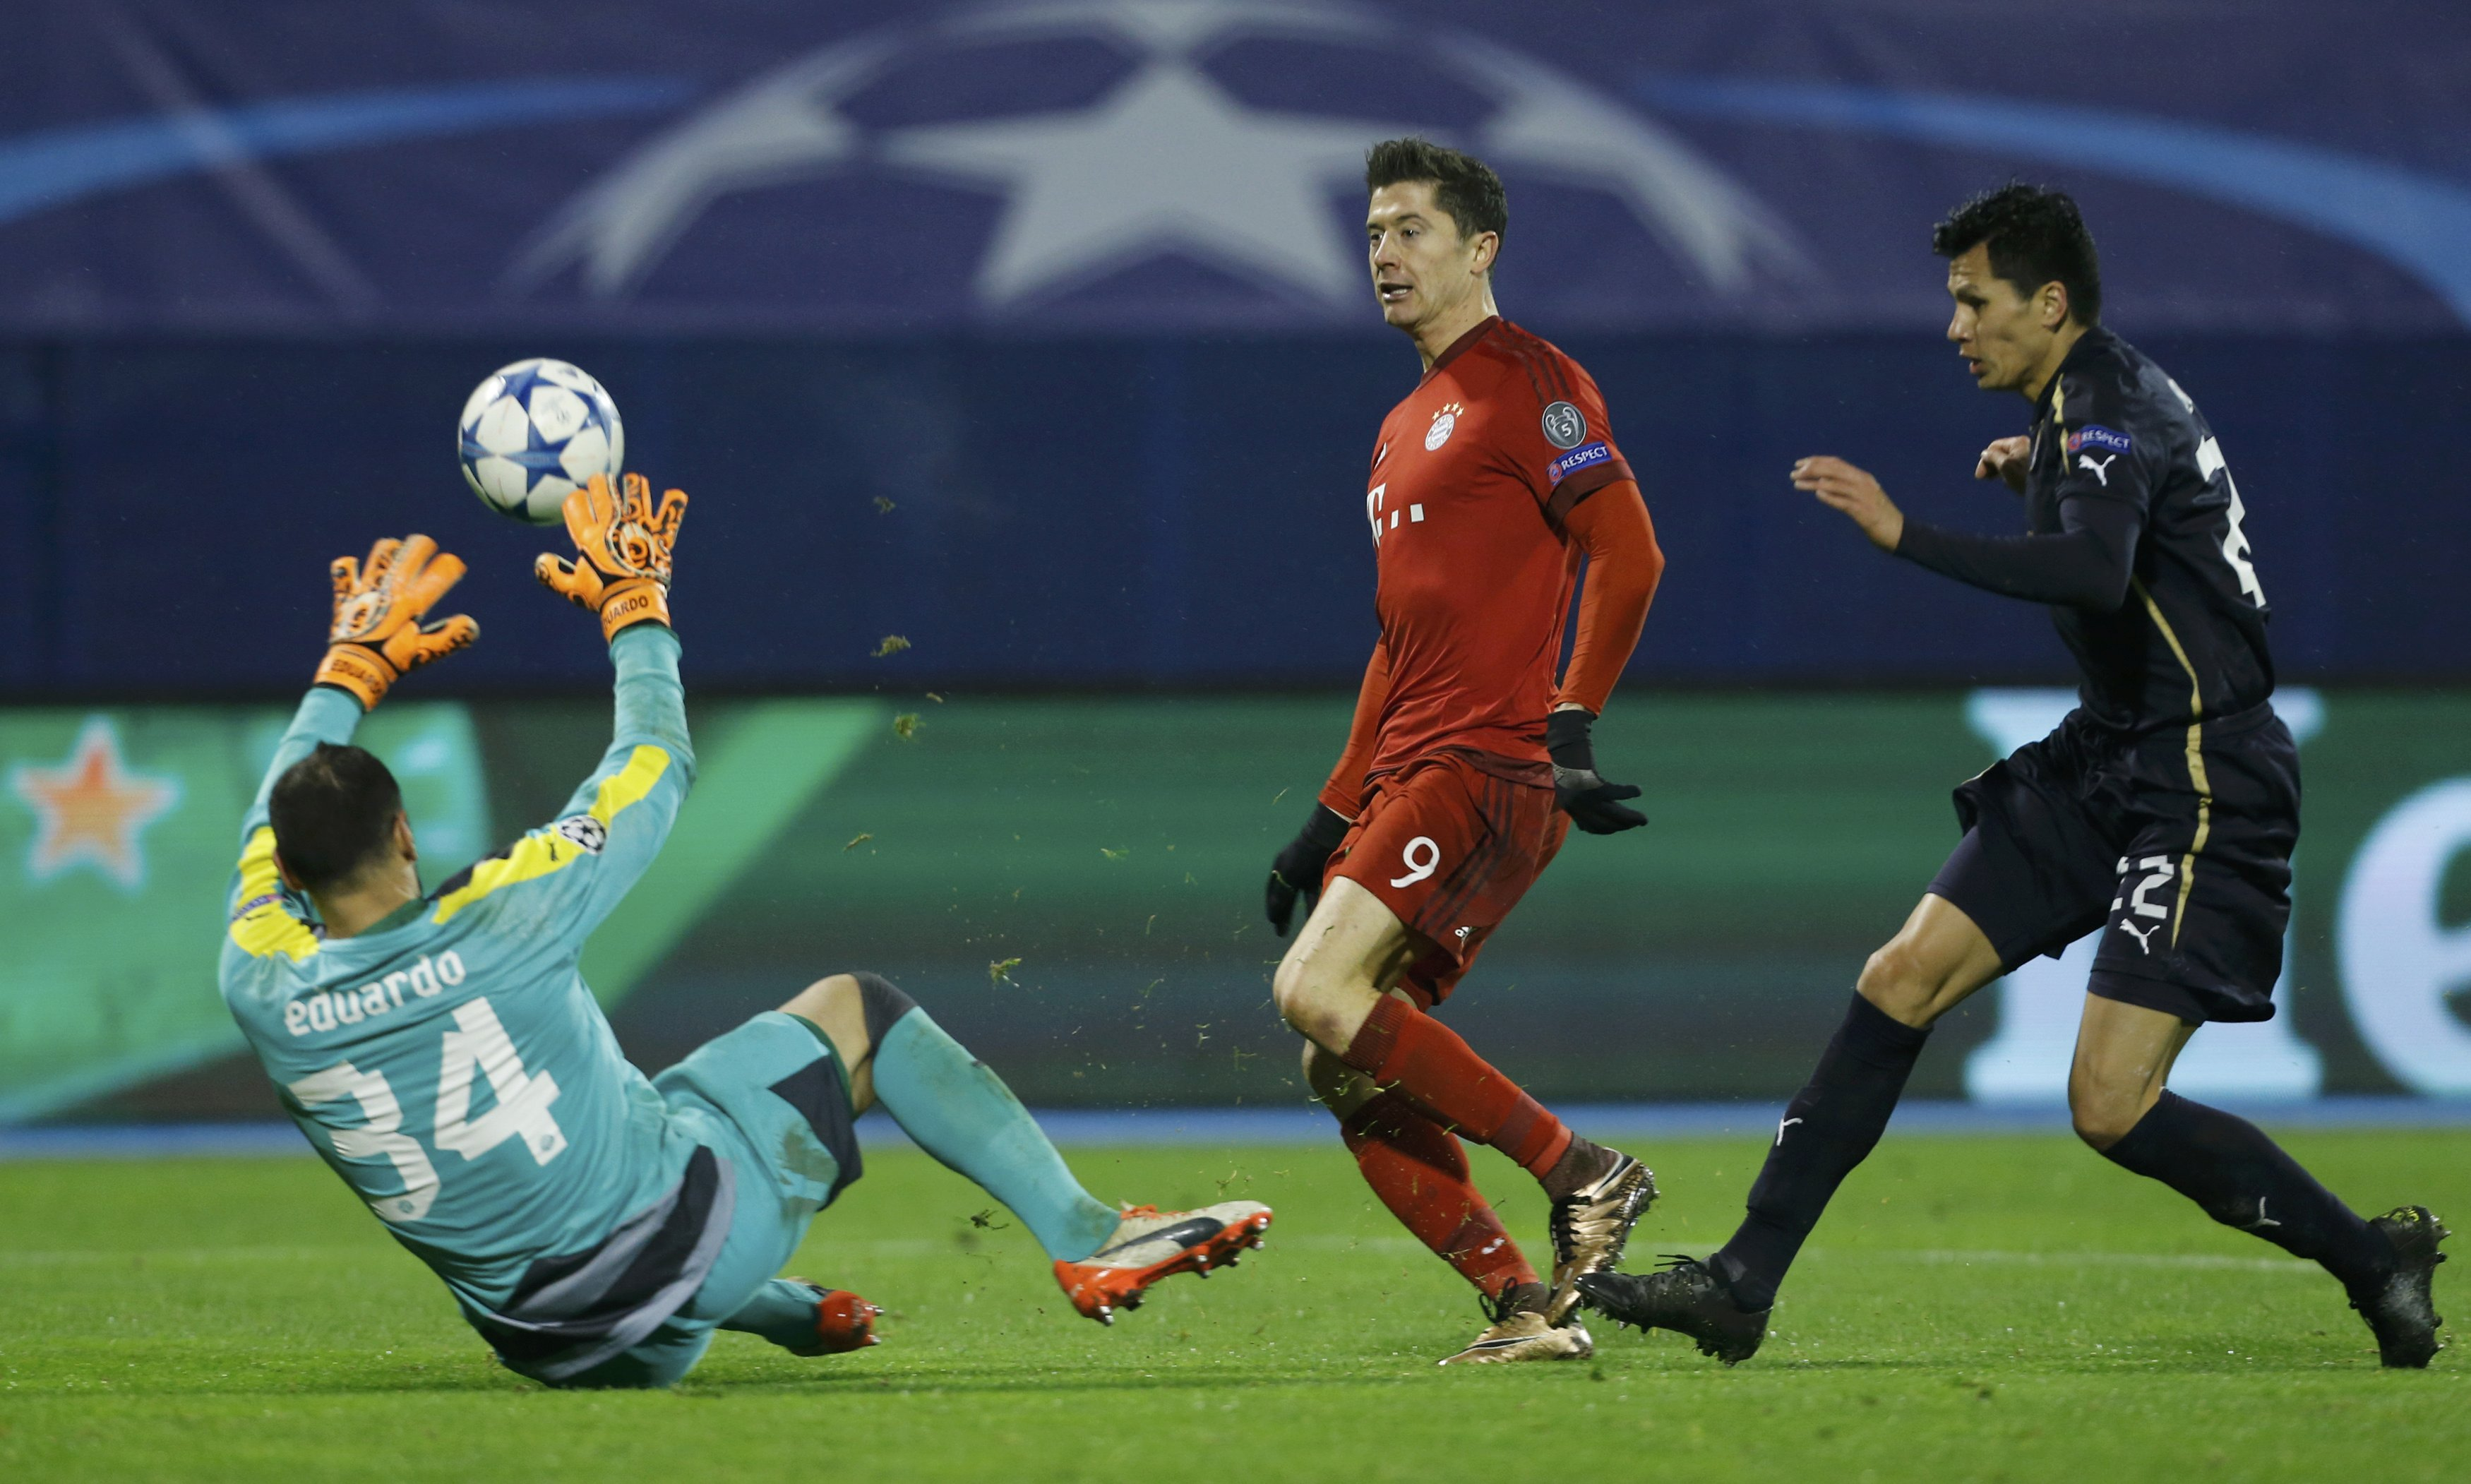 Bayern Munich's Robert Lewandowski scores a goal past Dinamo Zagreb's goalkeeper Eduardo during UEFA Champions League game at Maksimir stadium in Zagreb, on Wednesday, December 10, 2015. Photo: Reuters